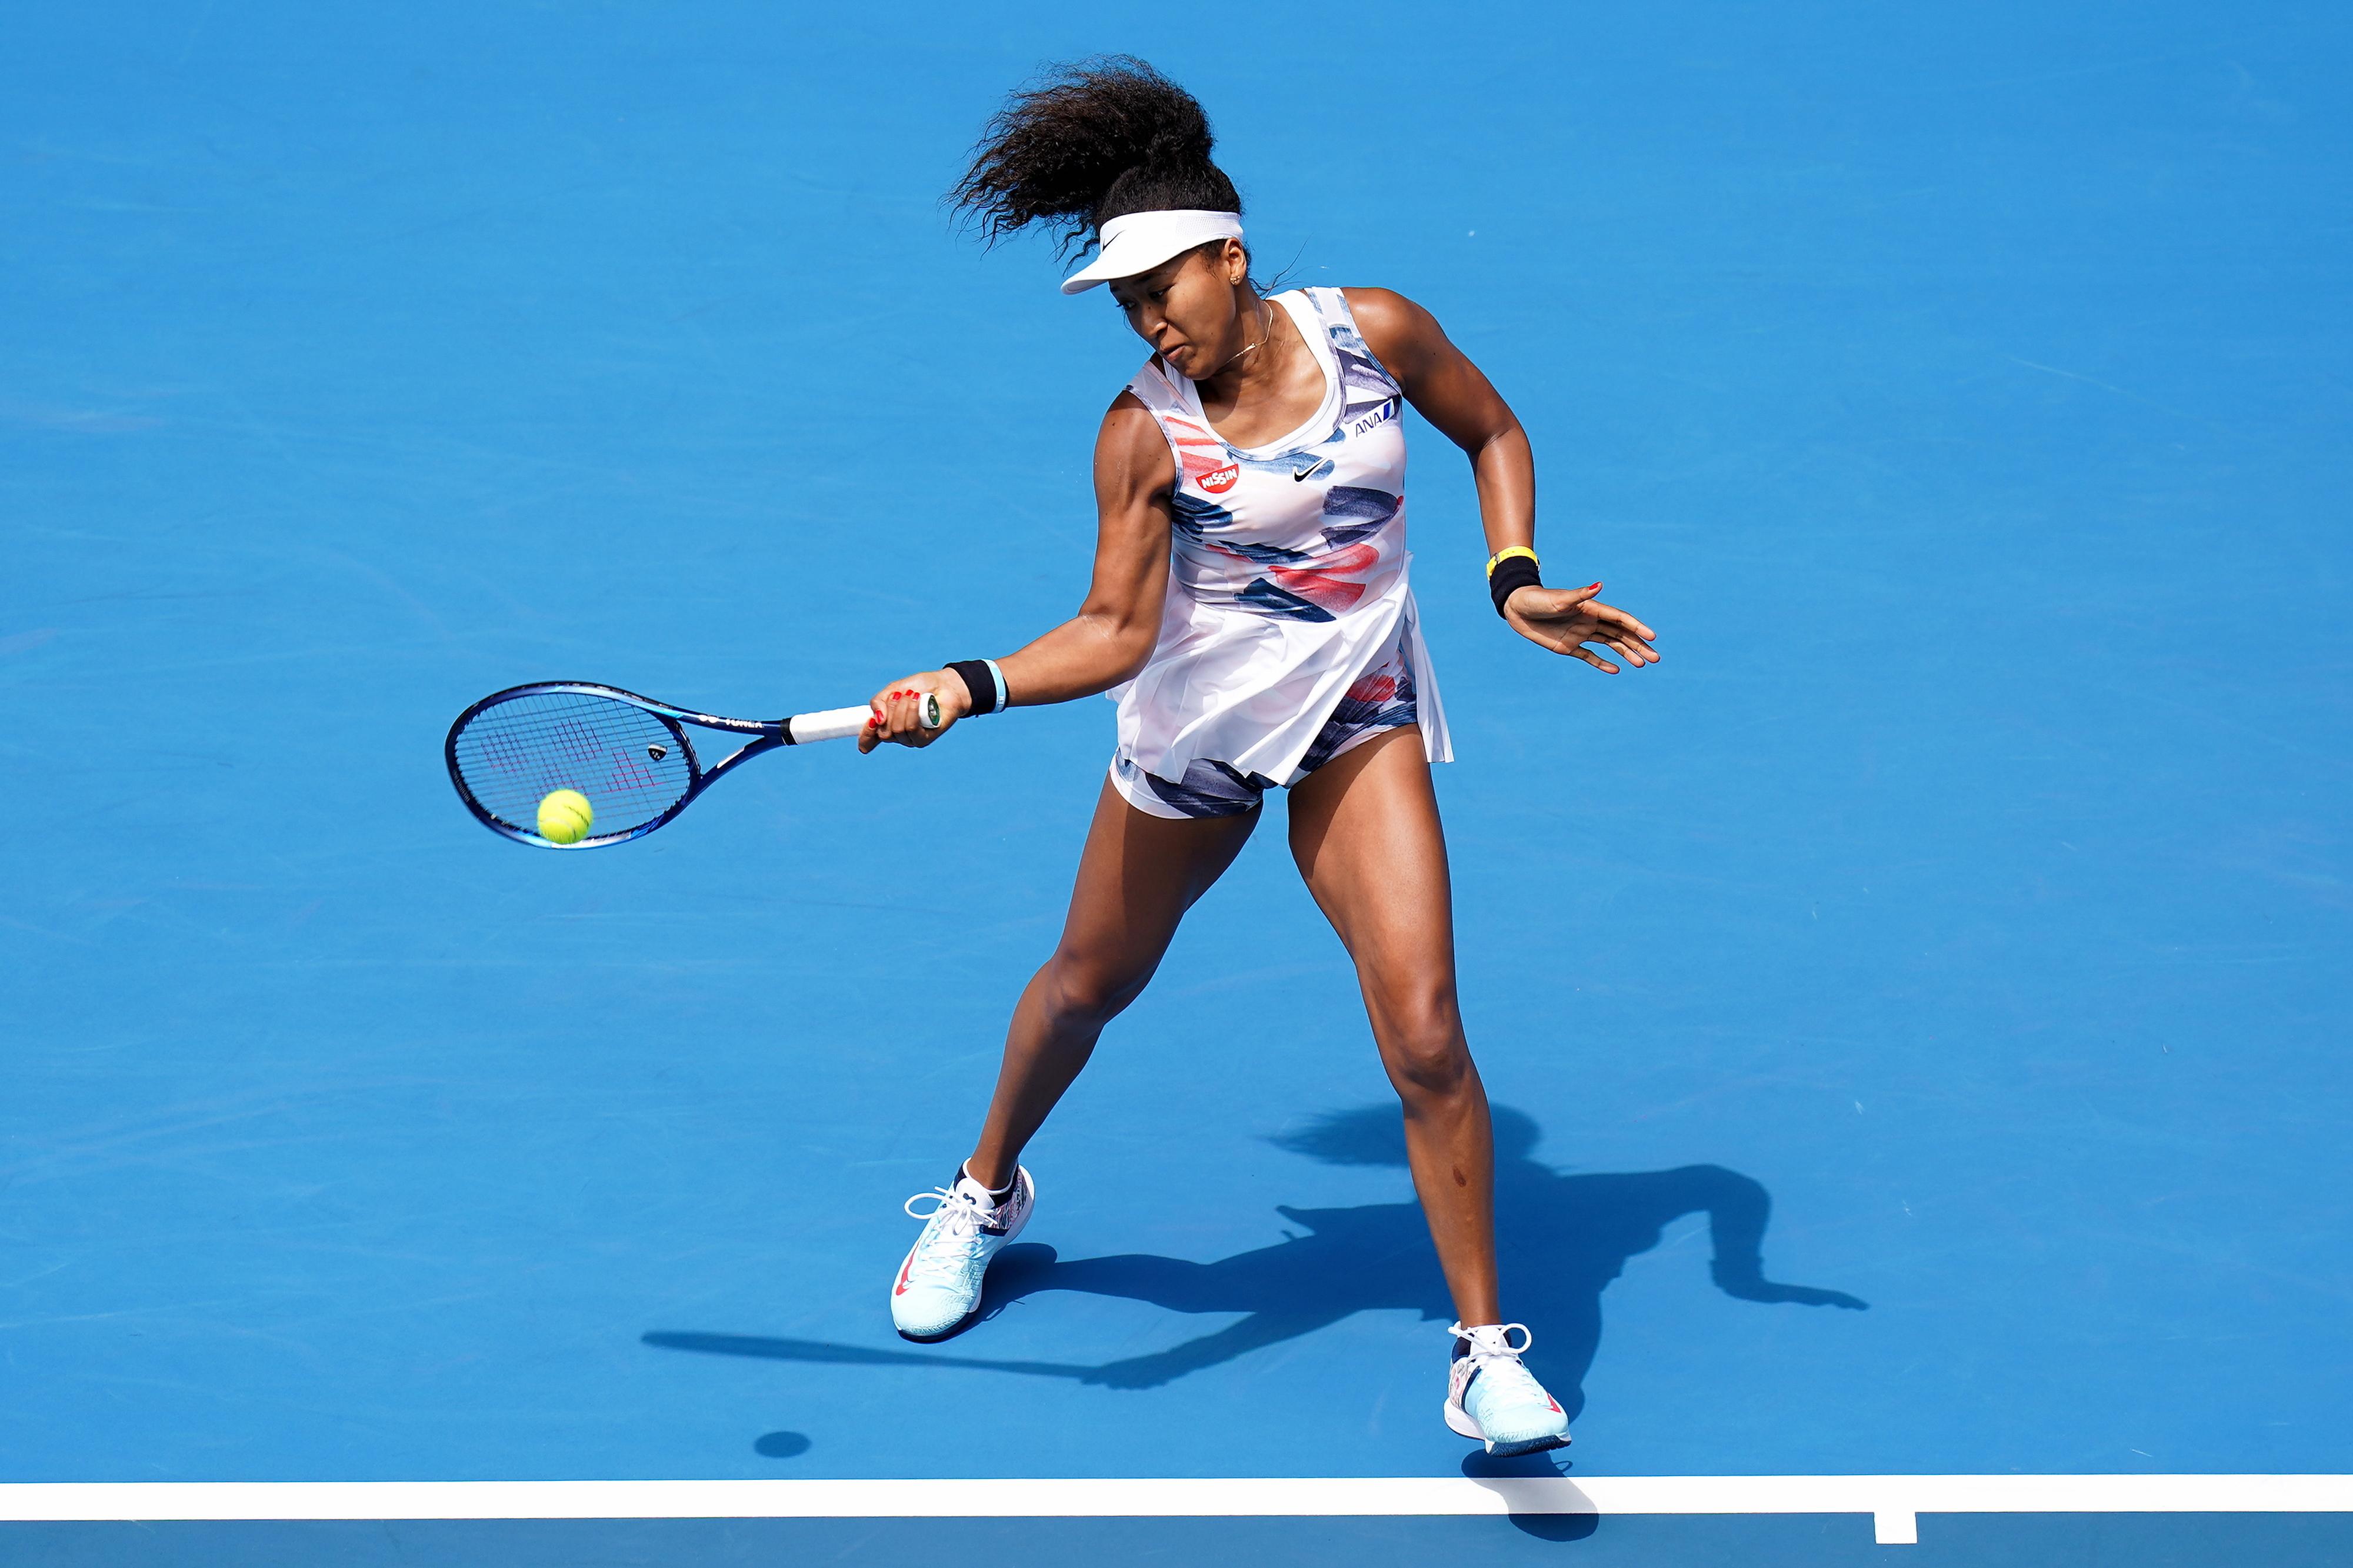 Naomi Osaka entra a vencer no Open da Austrália